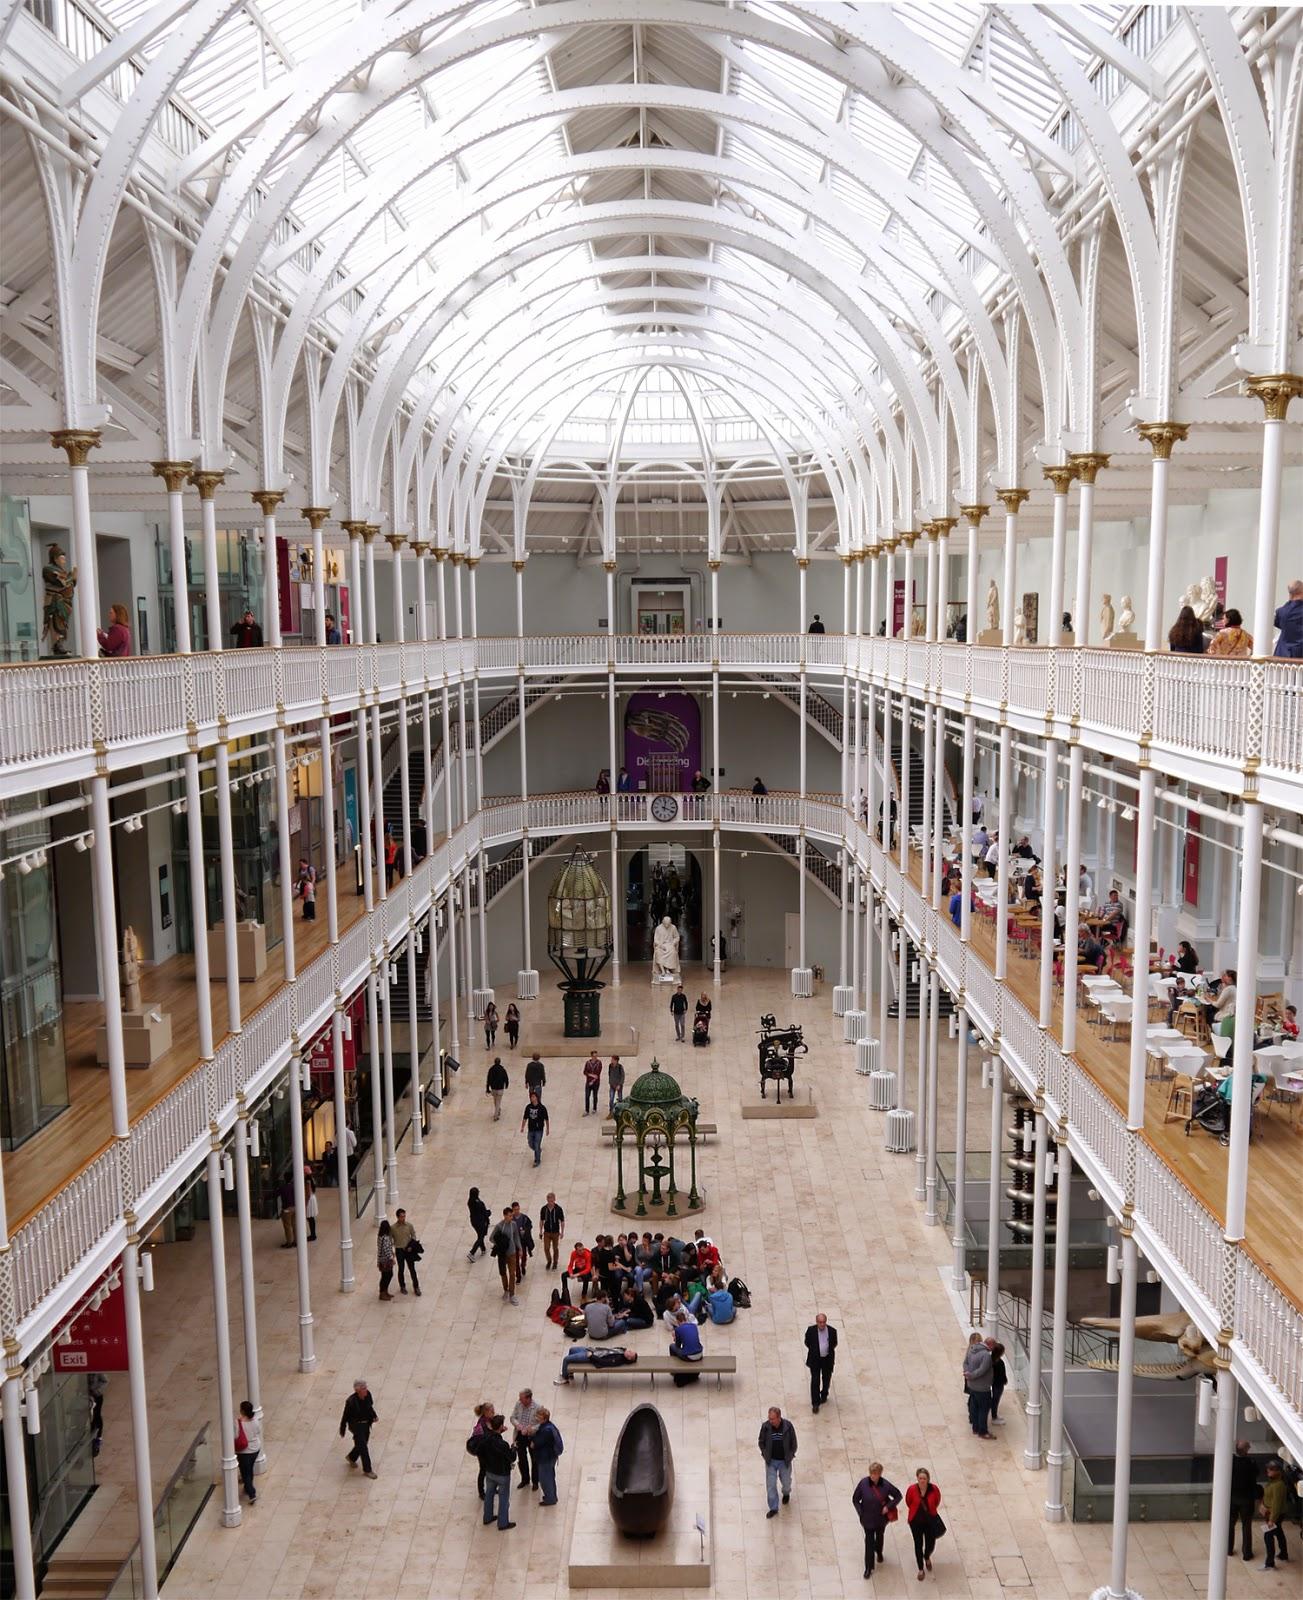 National Museum of Scotland, interior, museum, lighy, bright, scottish bloggers, edinburgh, edinburgh bloggers